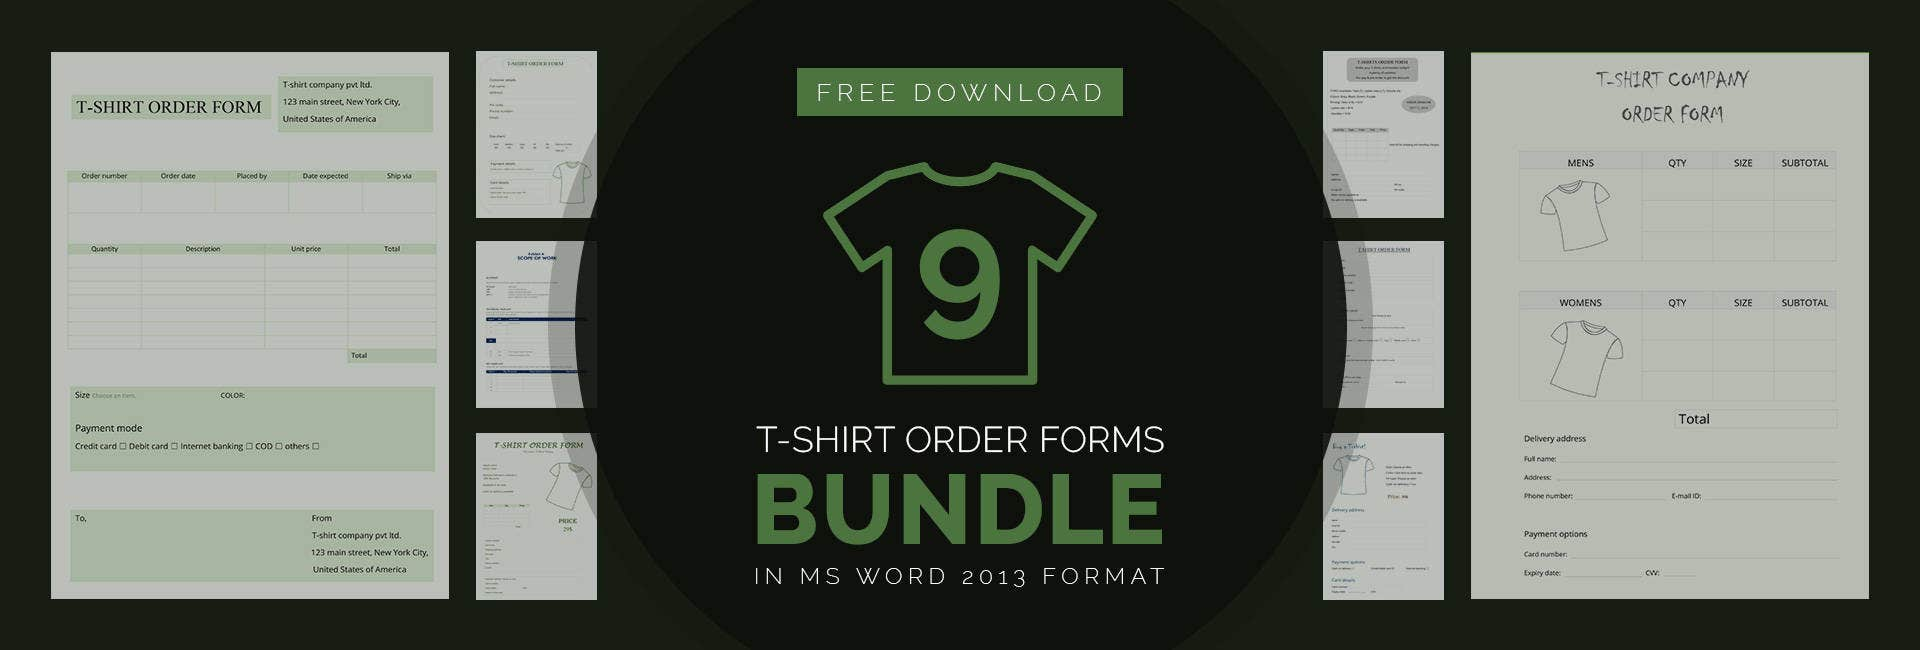 27 t shirt_order_forms_bundle